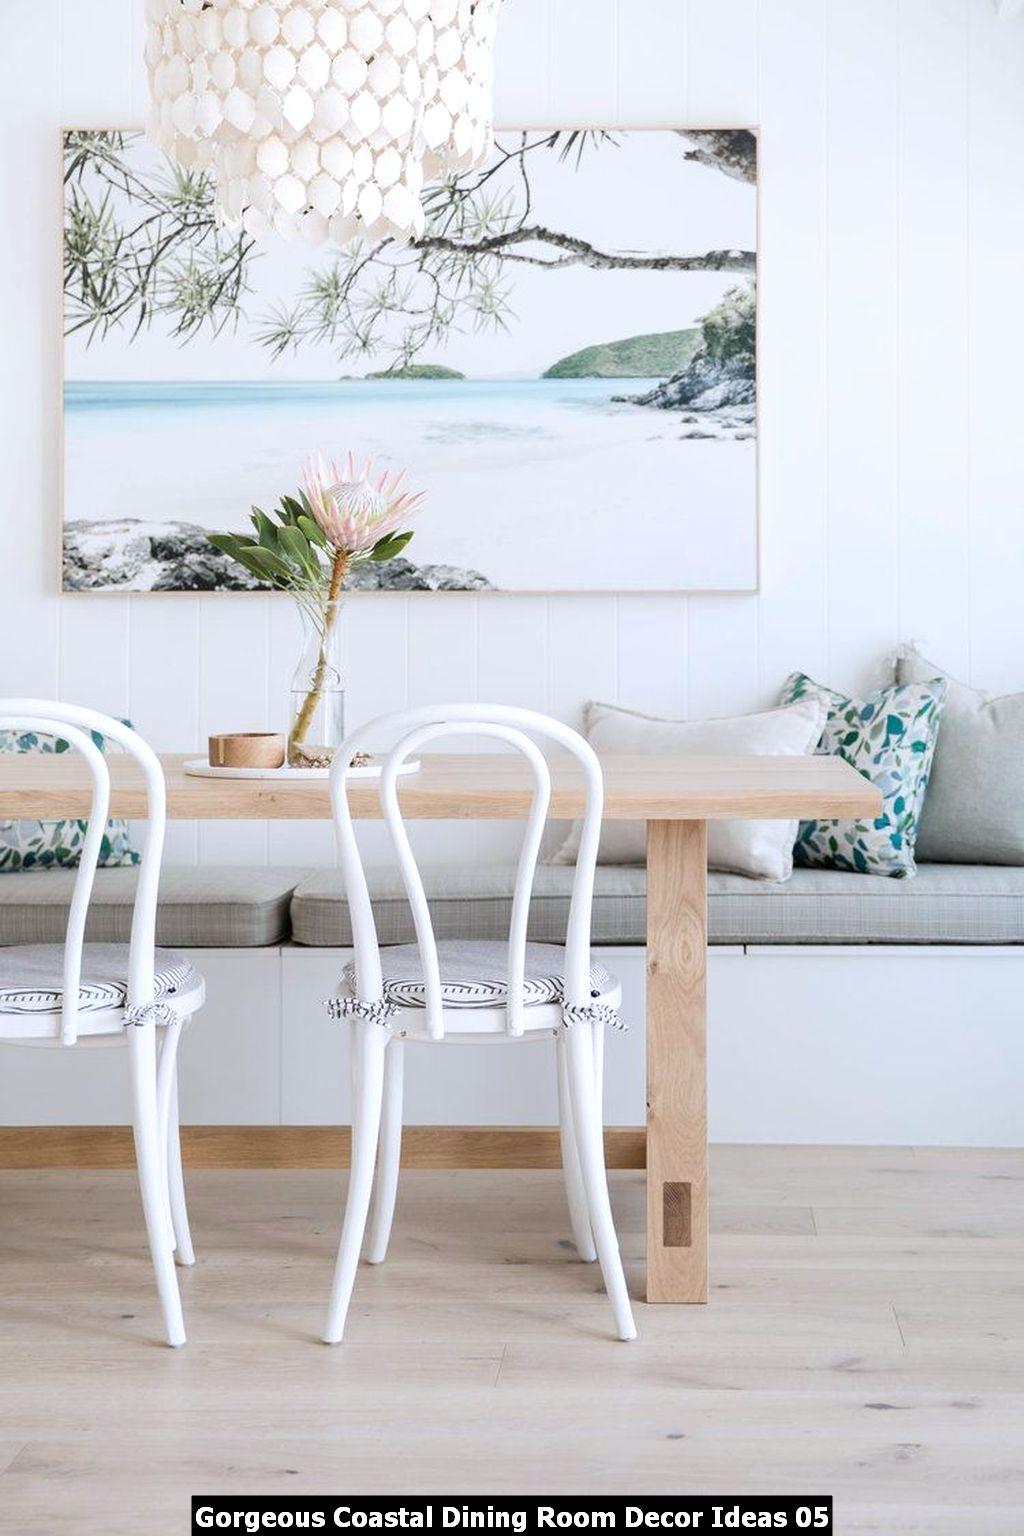 Gorgeous Coastal Dining Room Decor Ideas 05